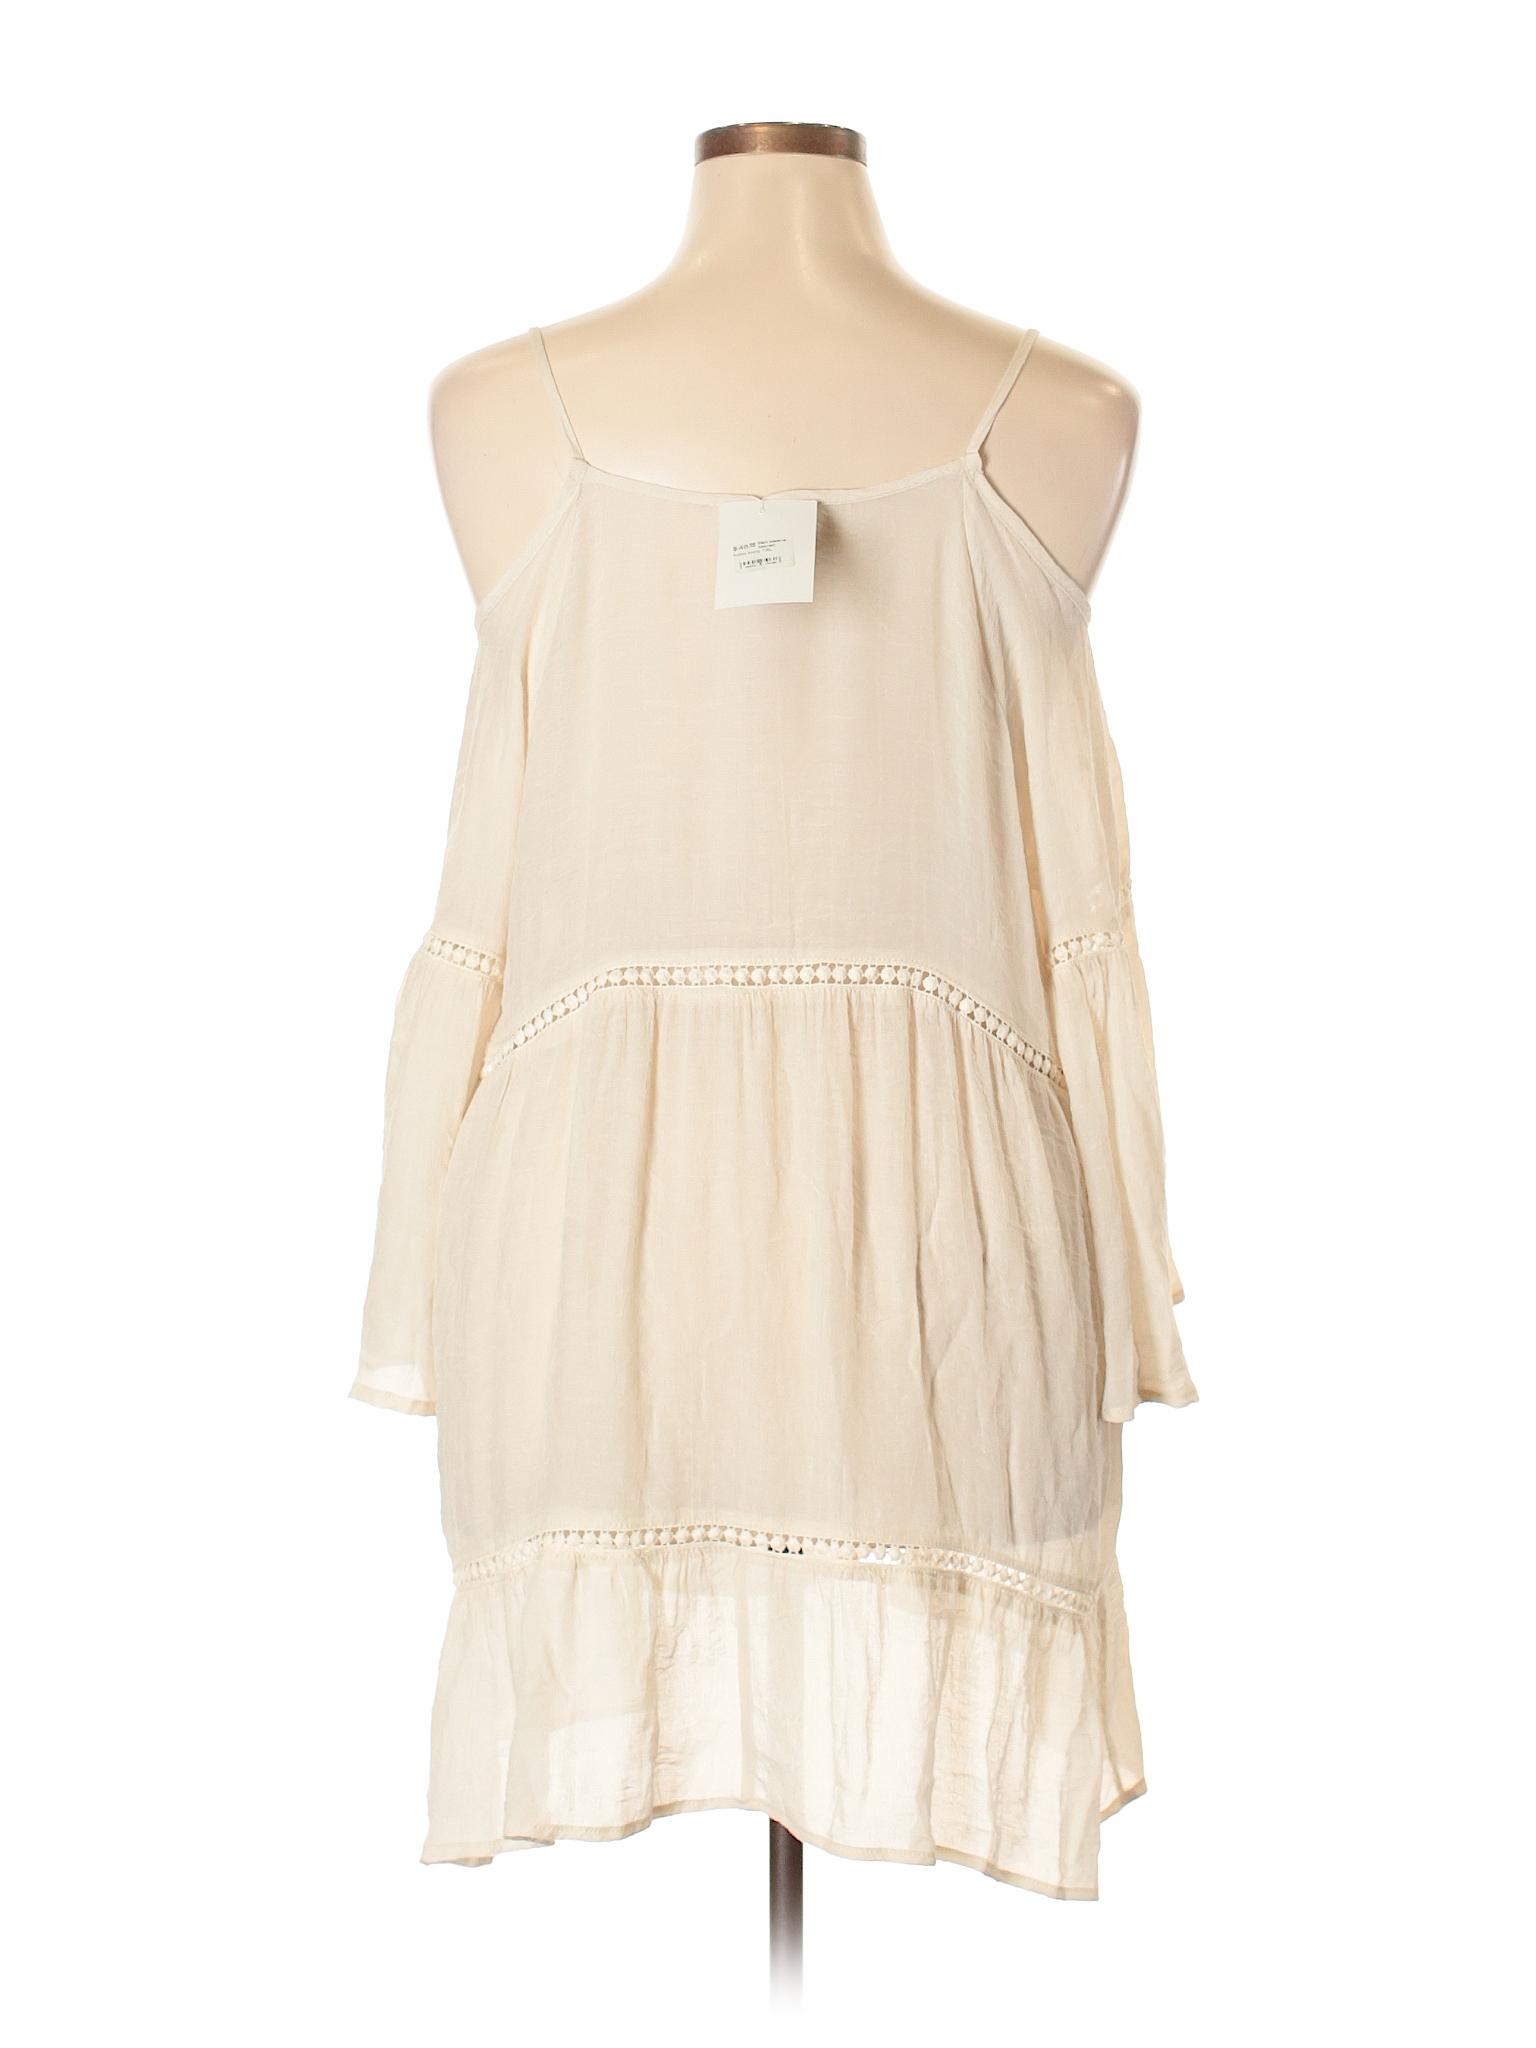 Umgee Dress Boutique Casual Dress Boutique Casual Casual winter Boutique Dress Umgee Umgee Umgee winter Boutique winter winter qHtwFxA